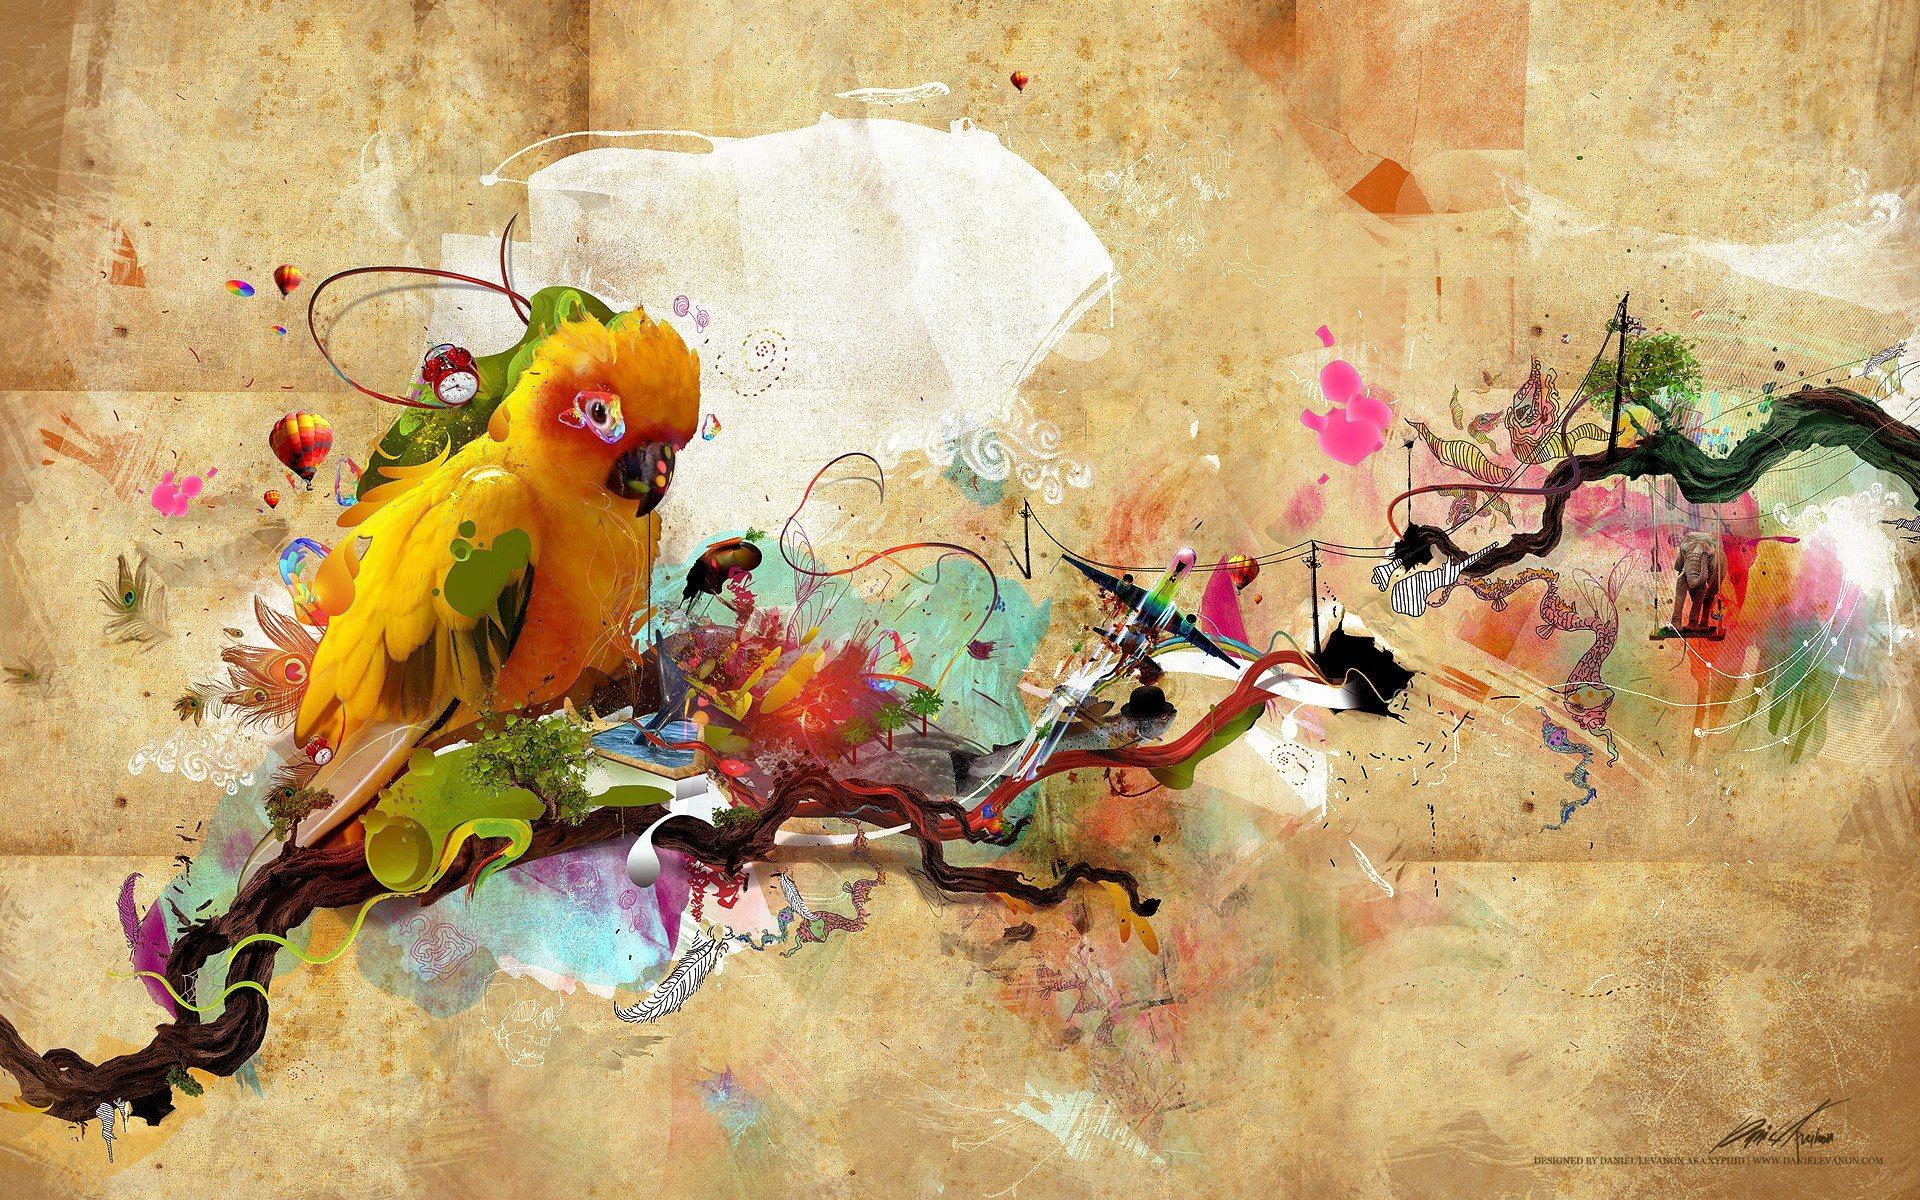 78+ images about Desktop backgrounds on Pinterest   Artistic